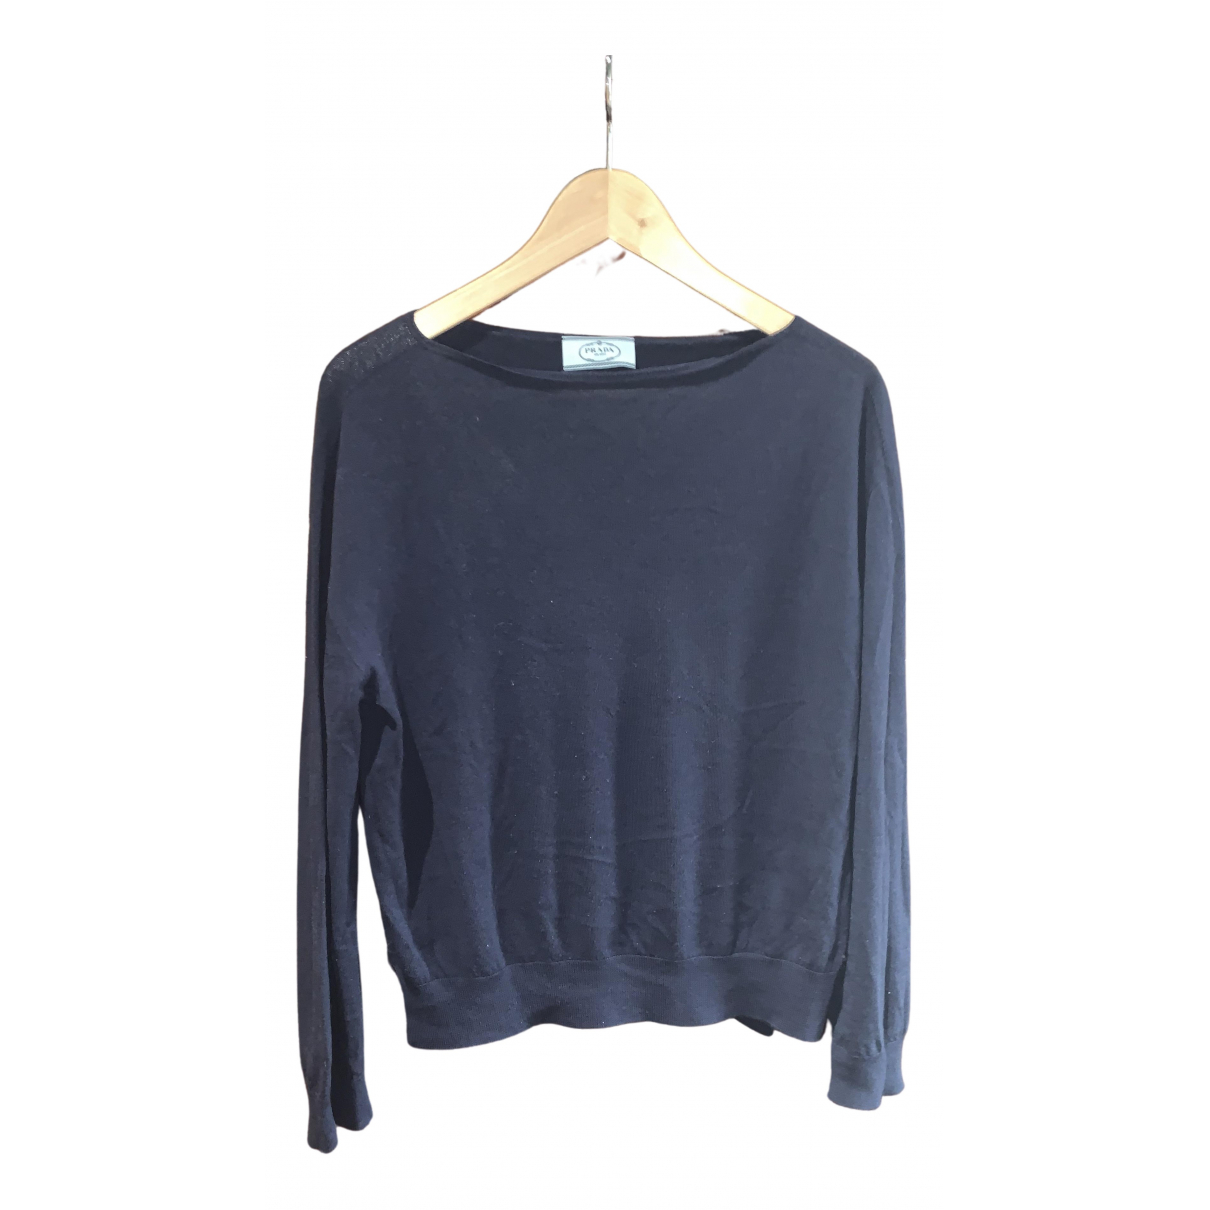 Prada \N Navy Cashmere Knitwear for Women M International